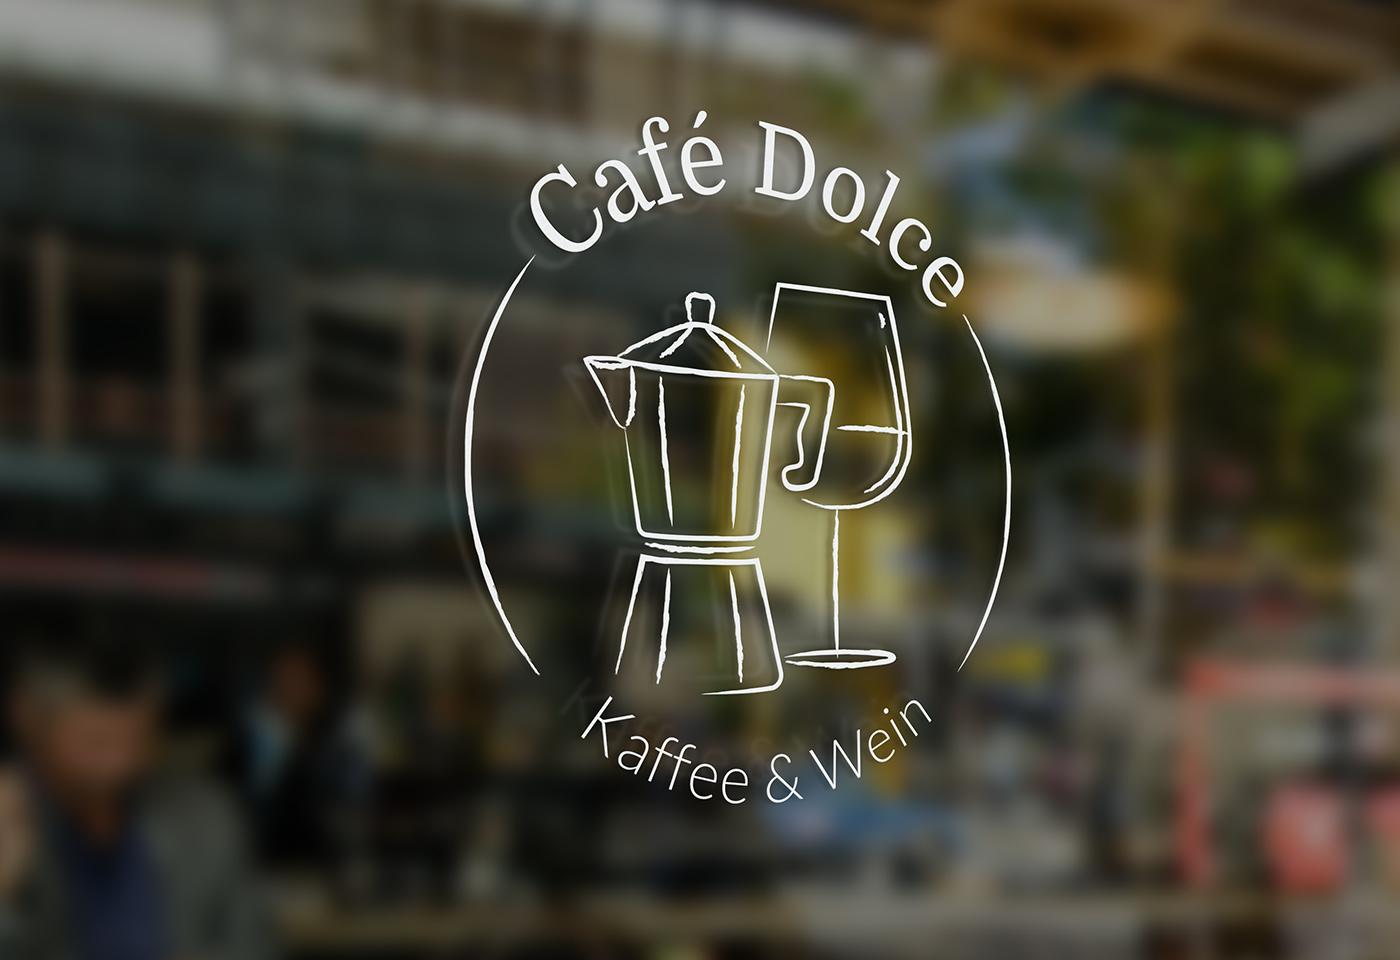 CafeDolce_2